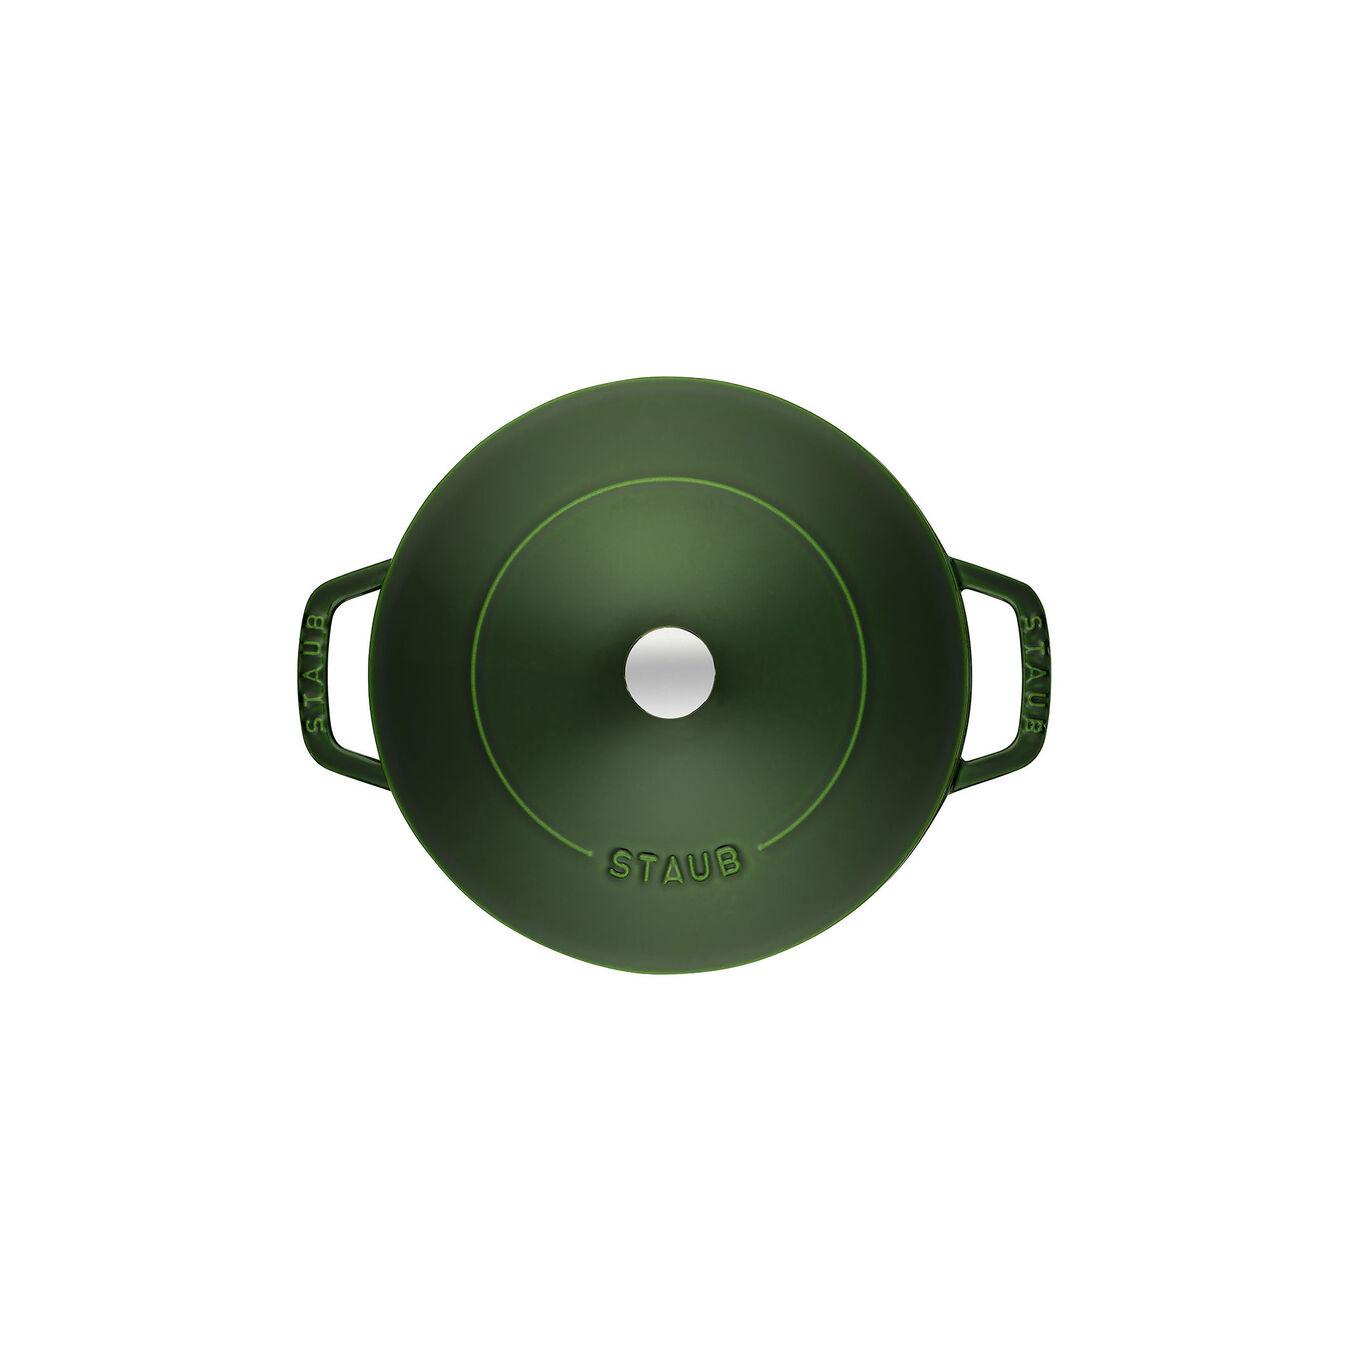 3.75 l Cast iron round Saute pan Chistera, Basil-Green,,large 5